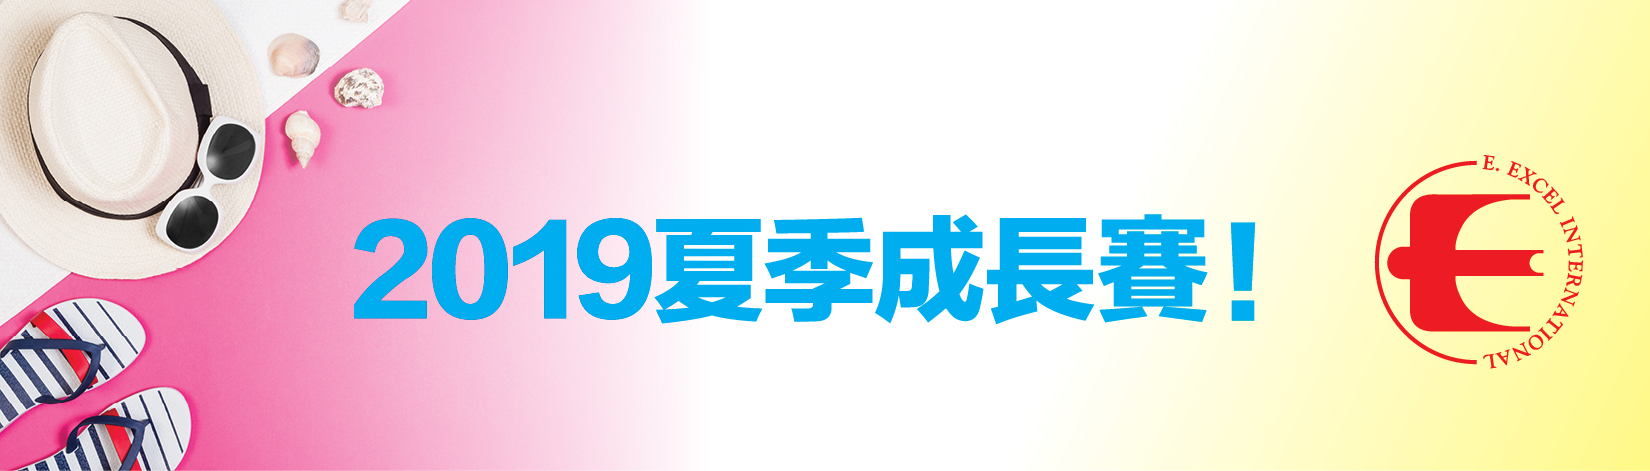 logo-v2-c.jpg